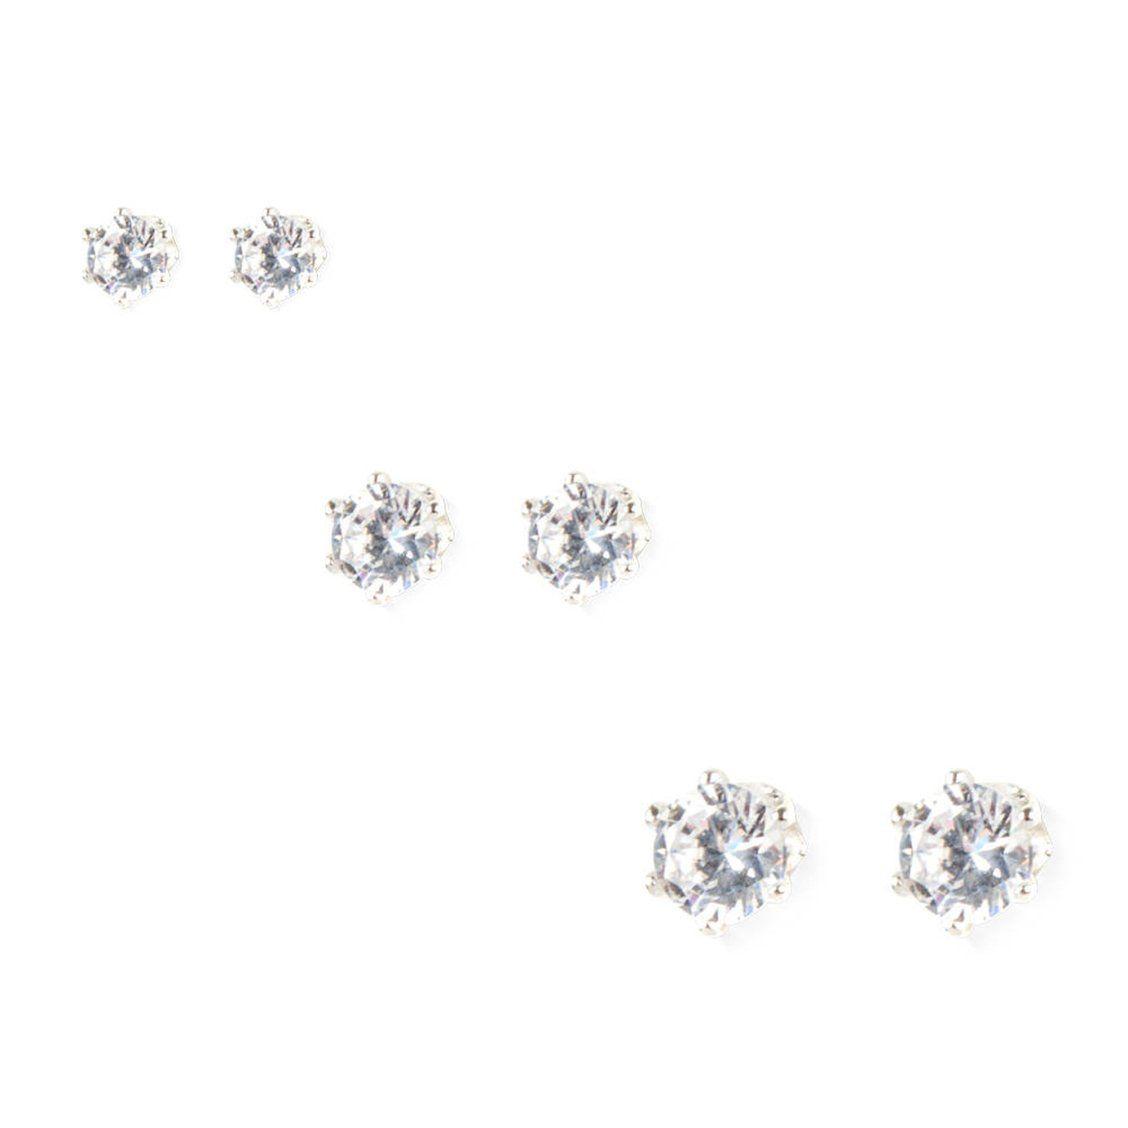 8934b6391b3b21 Round Cubic Zirconia Stud Earrings 3 Pack   3MM, 4MM and 5MM round cubic  zirconia stud earrings provide plenty of pretty sparkle.